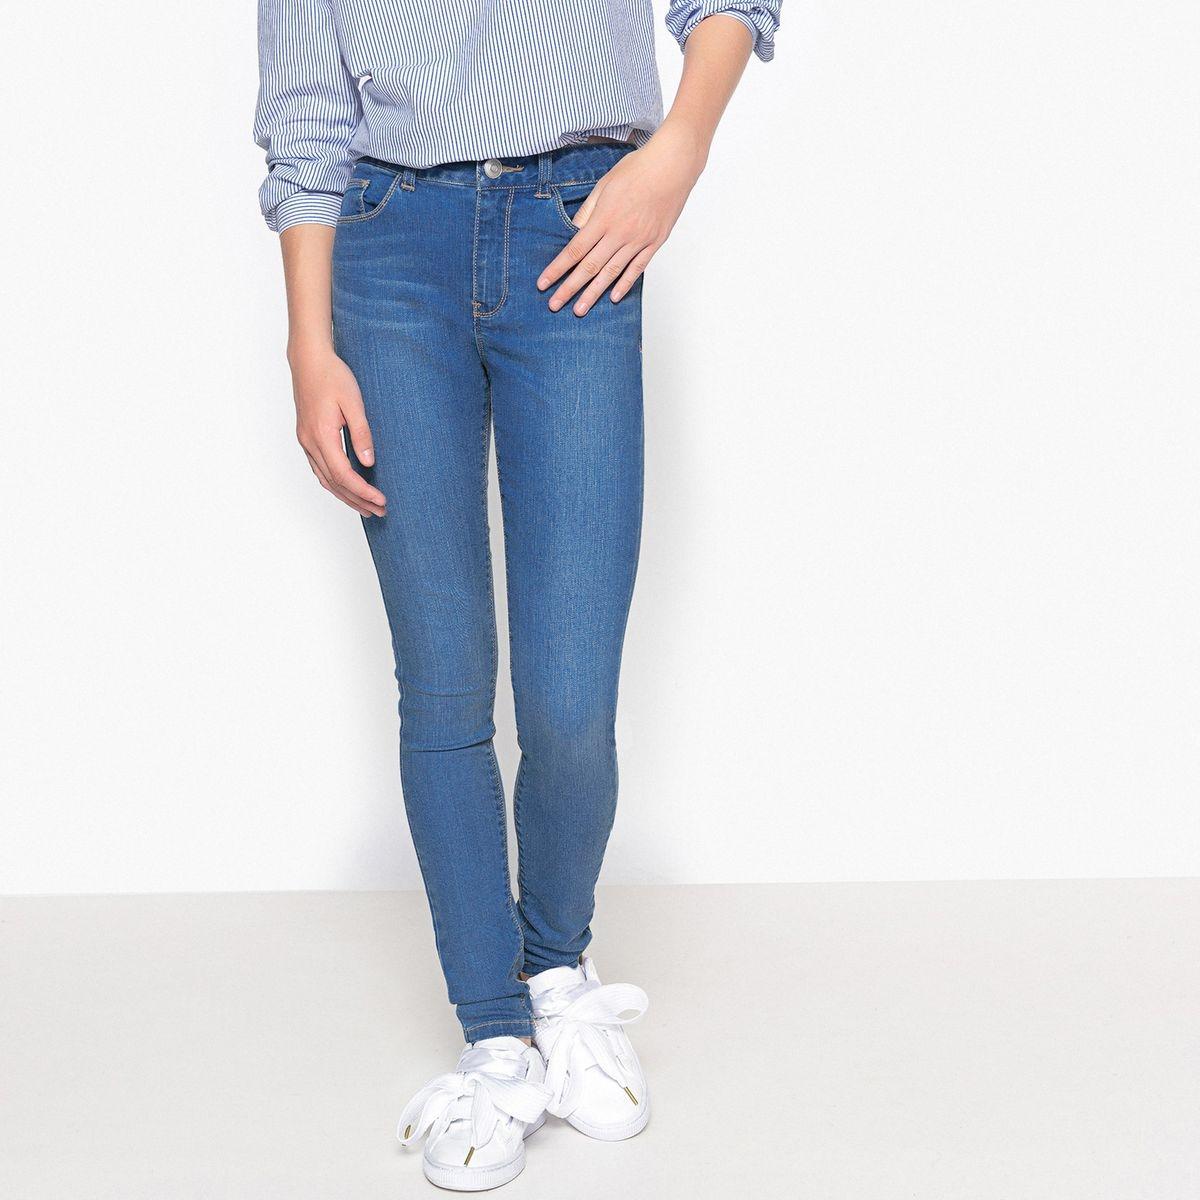 Jean super skinny 10-16 ans